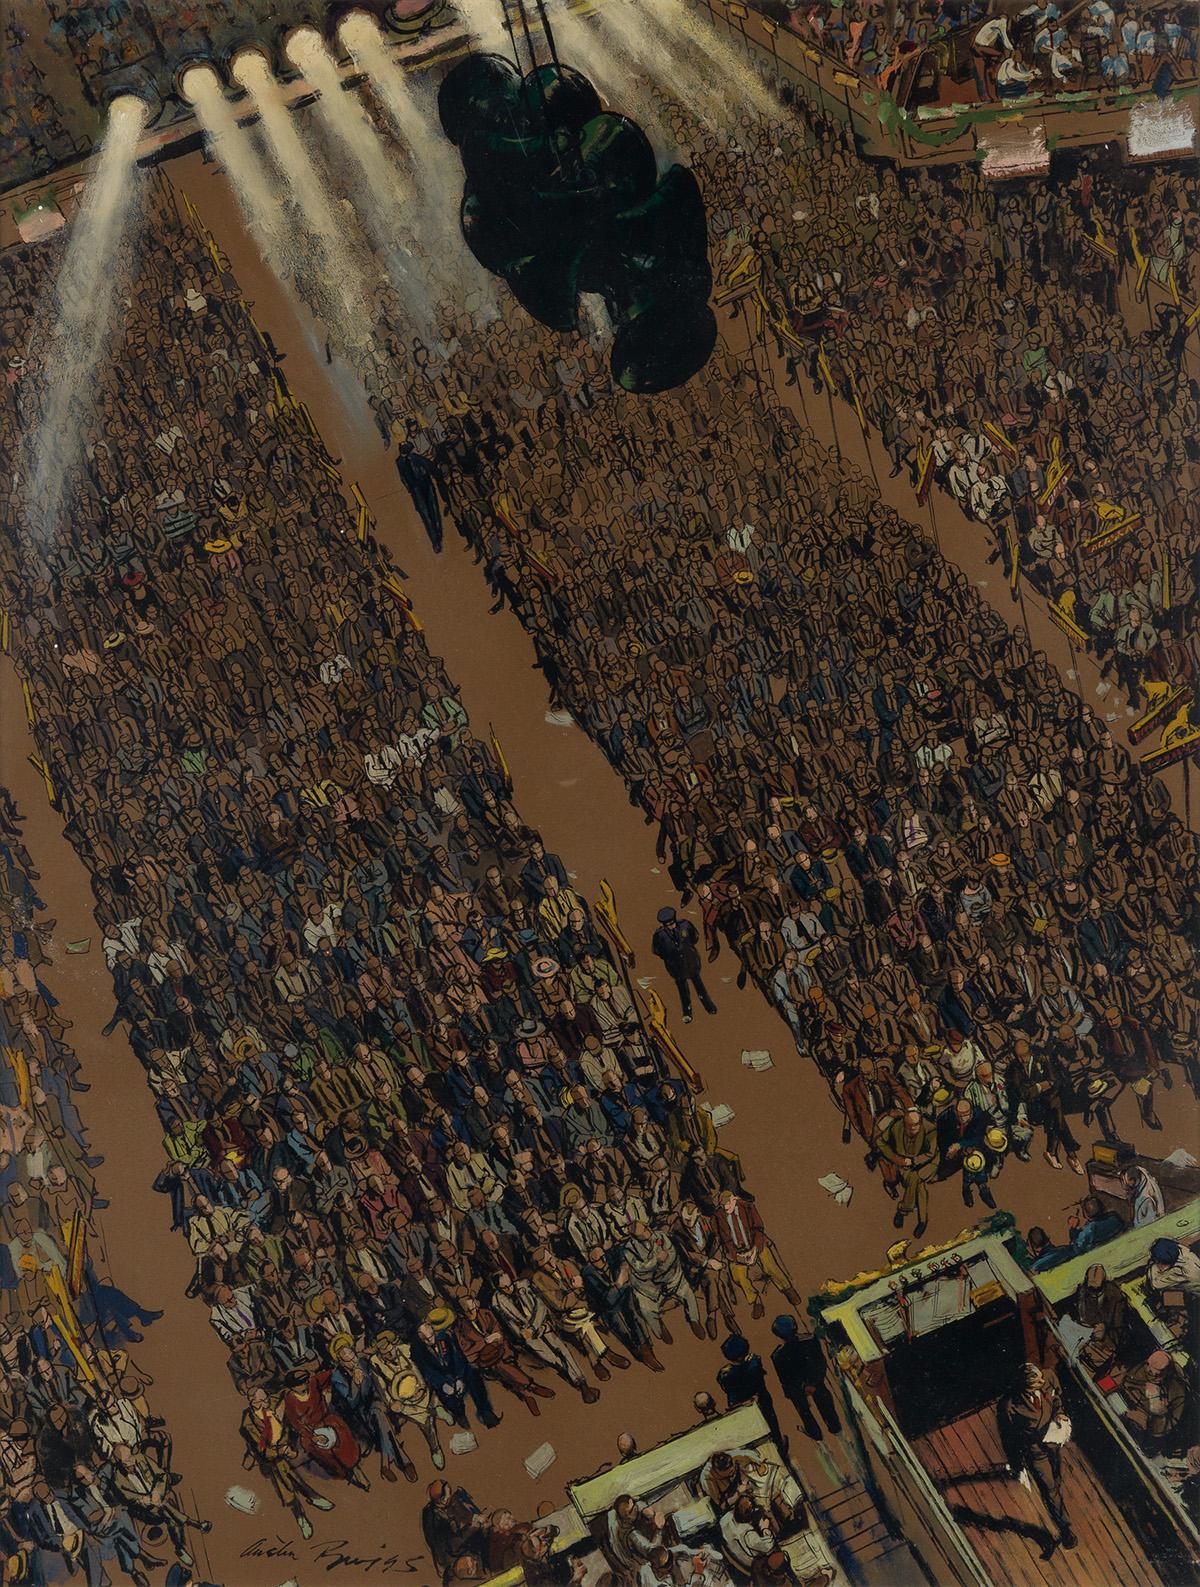 POLITICS-AUSTIN-BRIGGS-The-speech-was-over;-the-huge-crowd-s